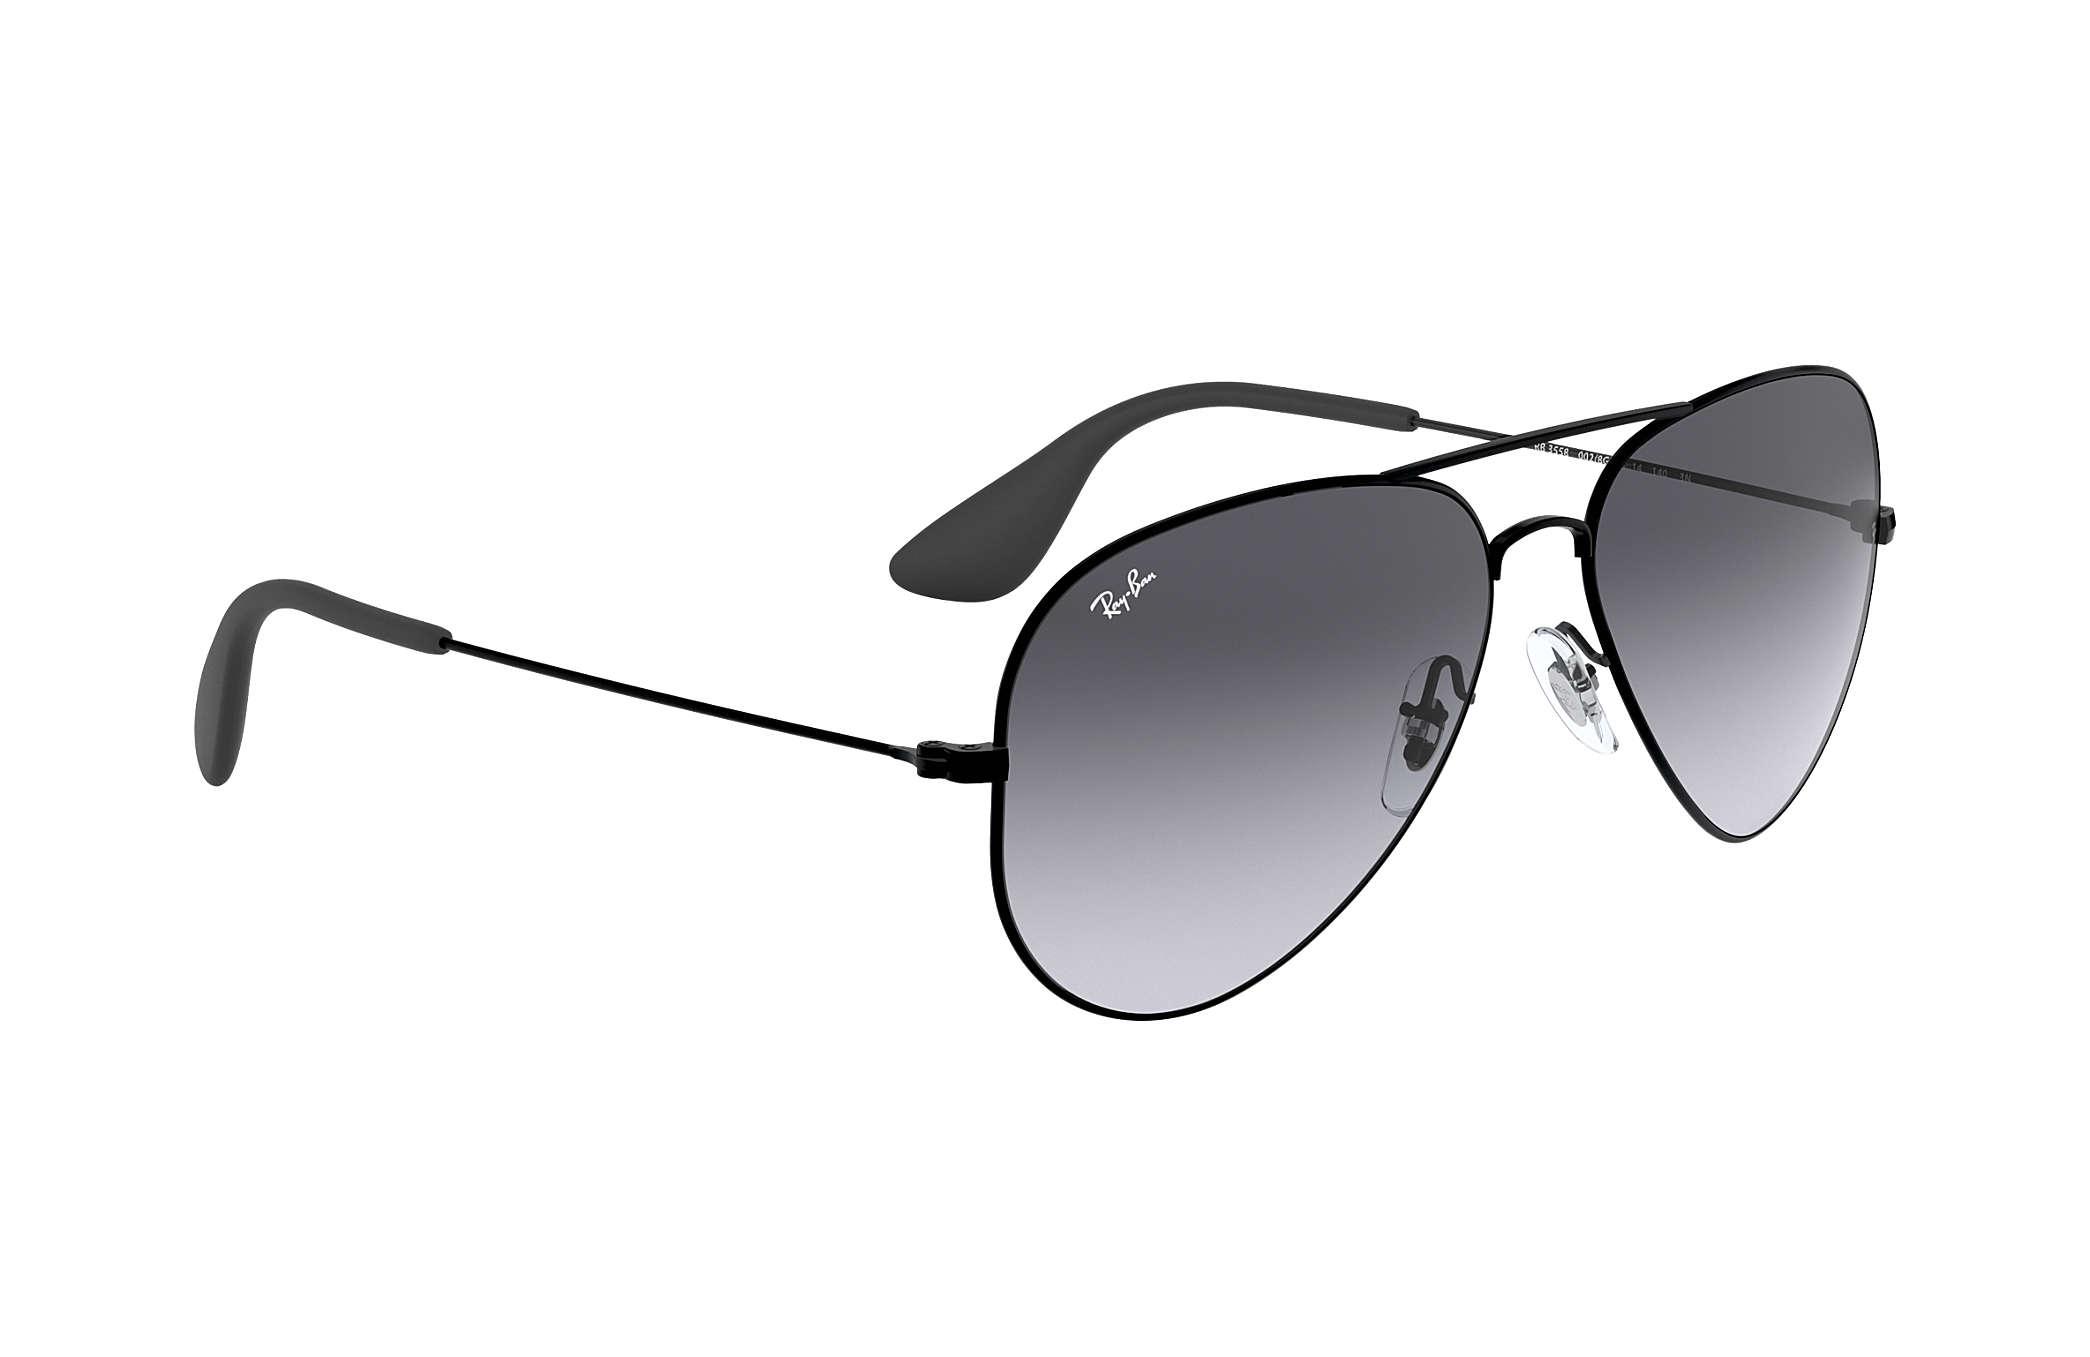 6dc0edc72c Ray-Ban RB3558 Black - Metal - Grey Lenses - 0RB3558002 8G58